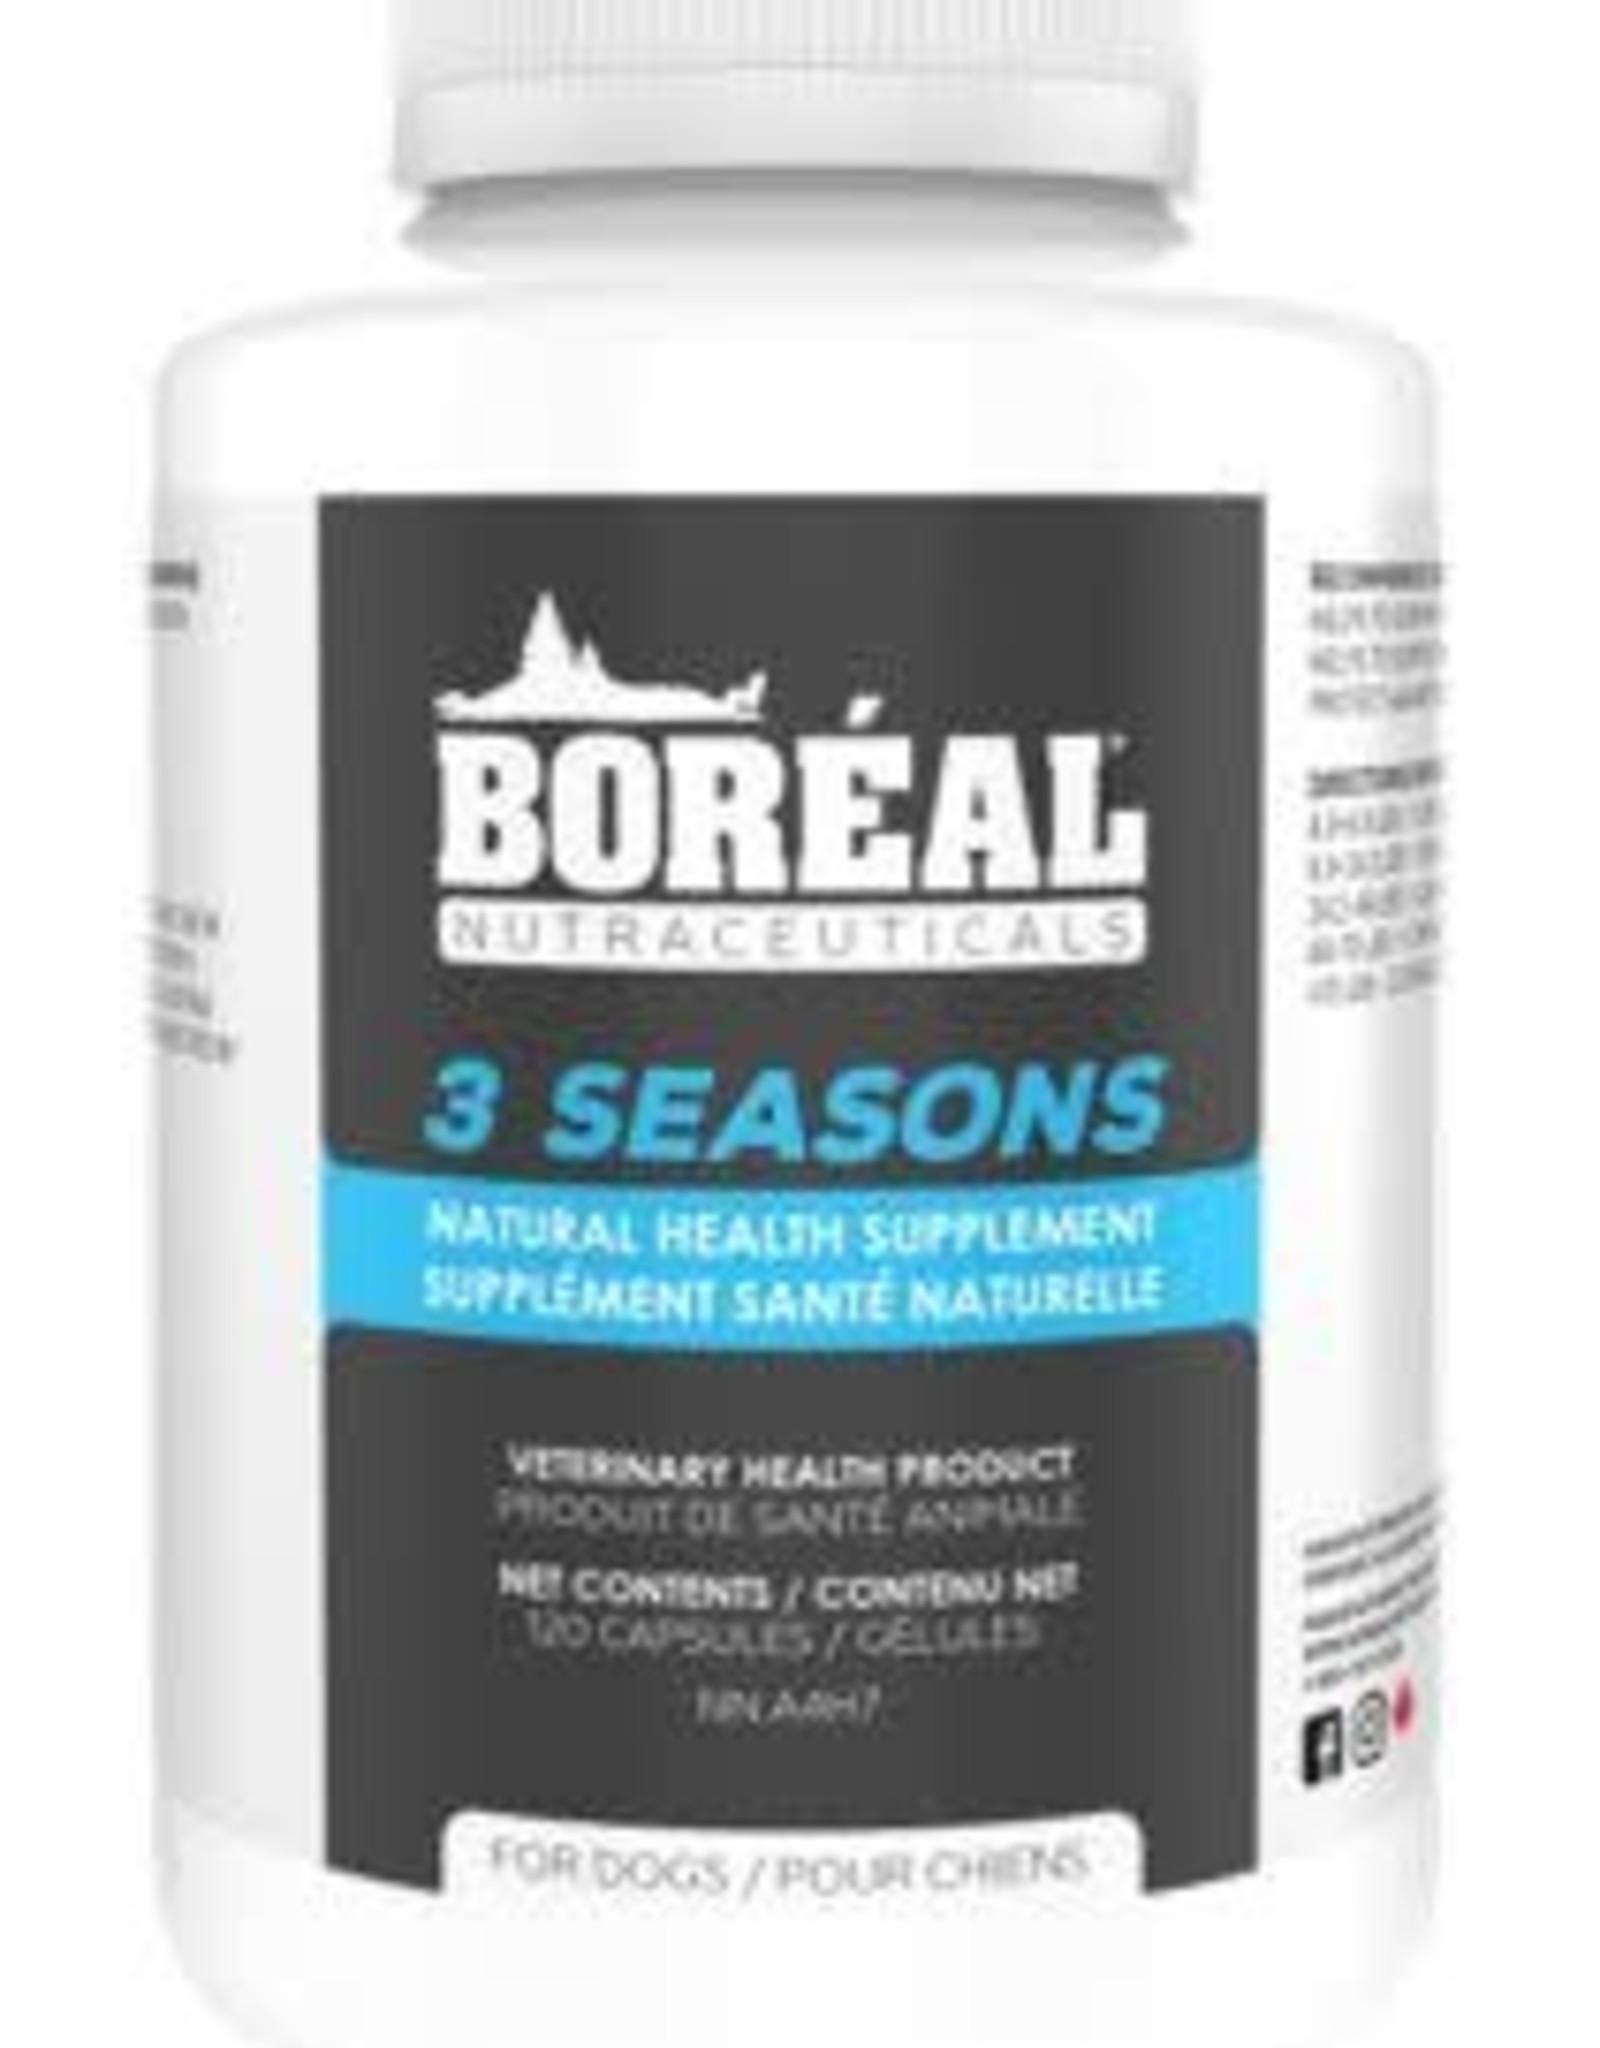 Boreal Boreal 3 Seasons Natural Health Supplement 60 Capsules Dog